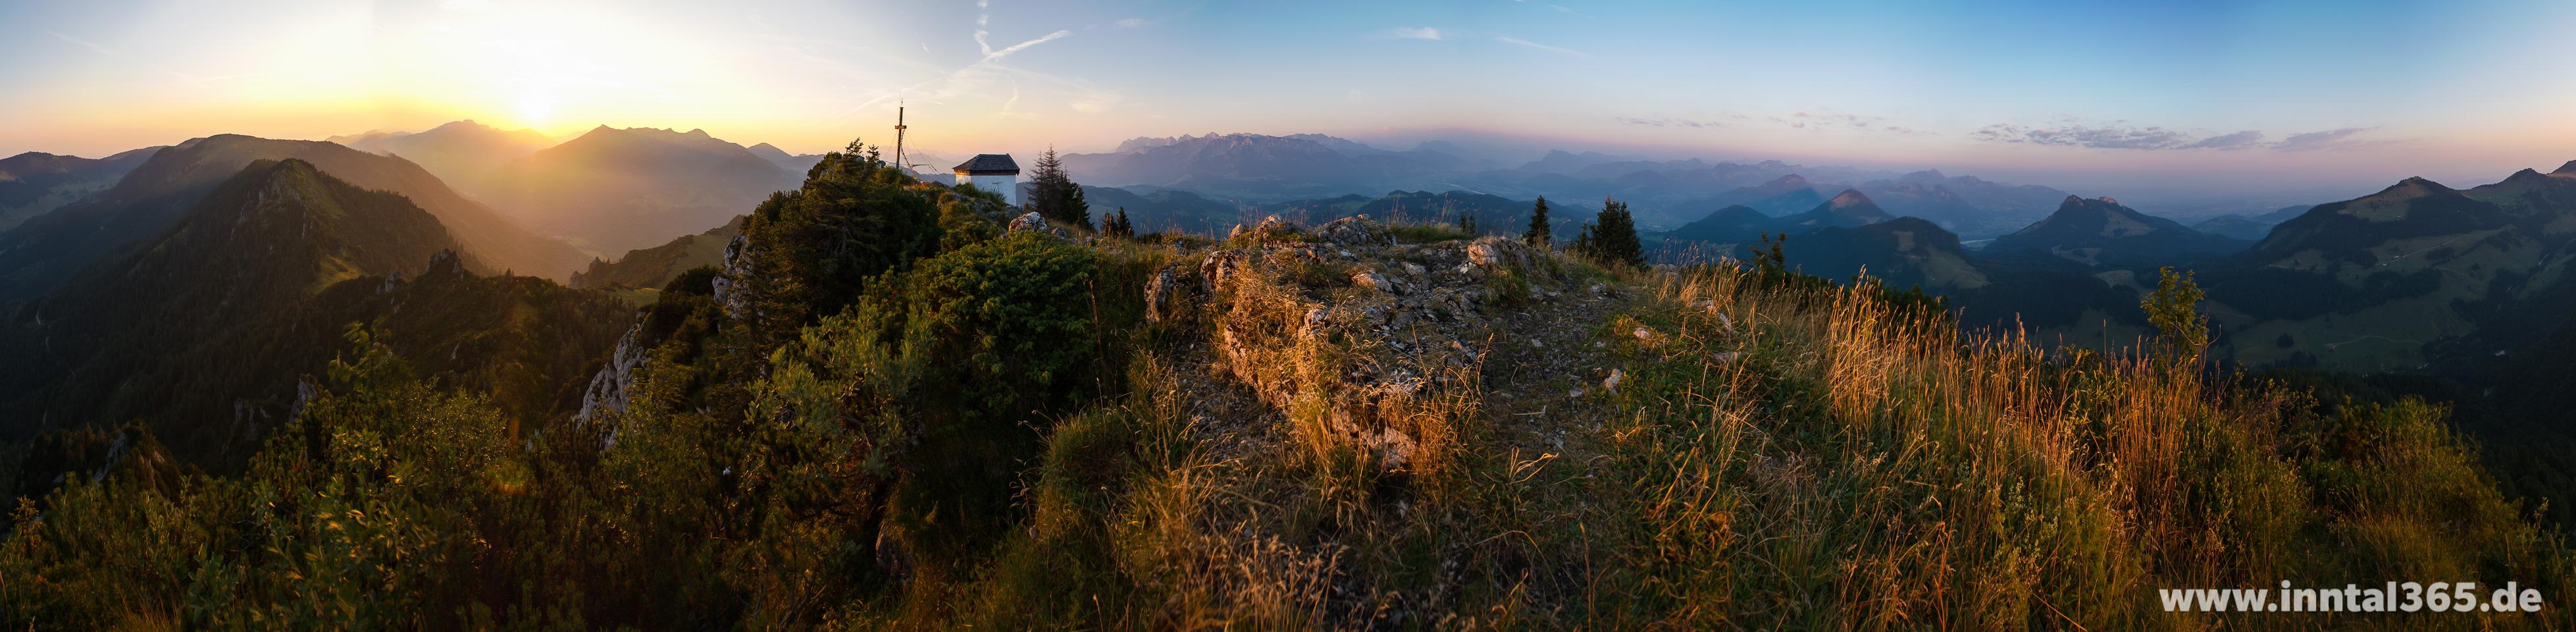 17.08.2015 - Spitzstein-Gipfelpanorama